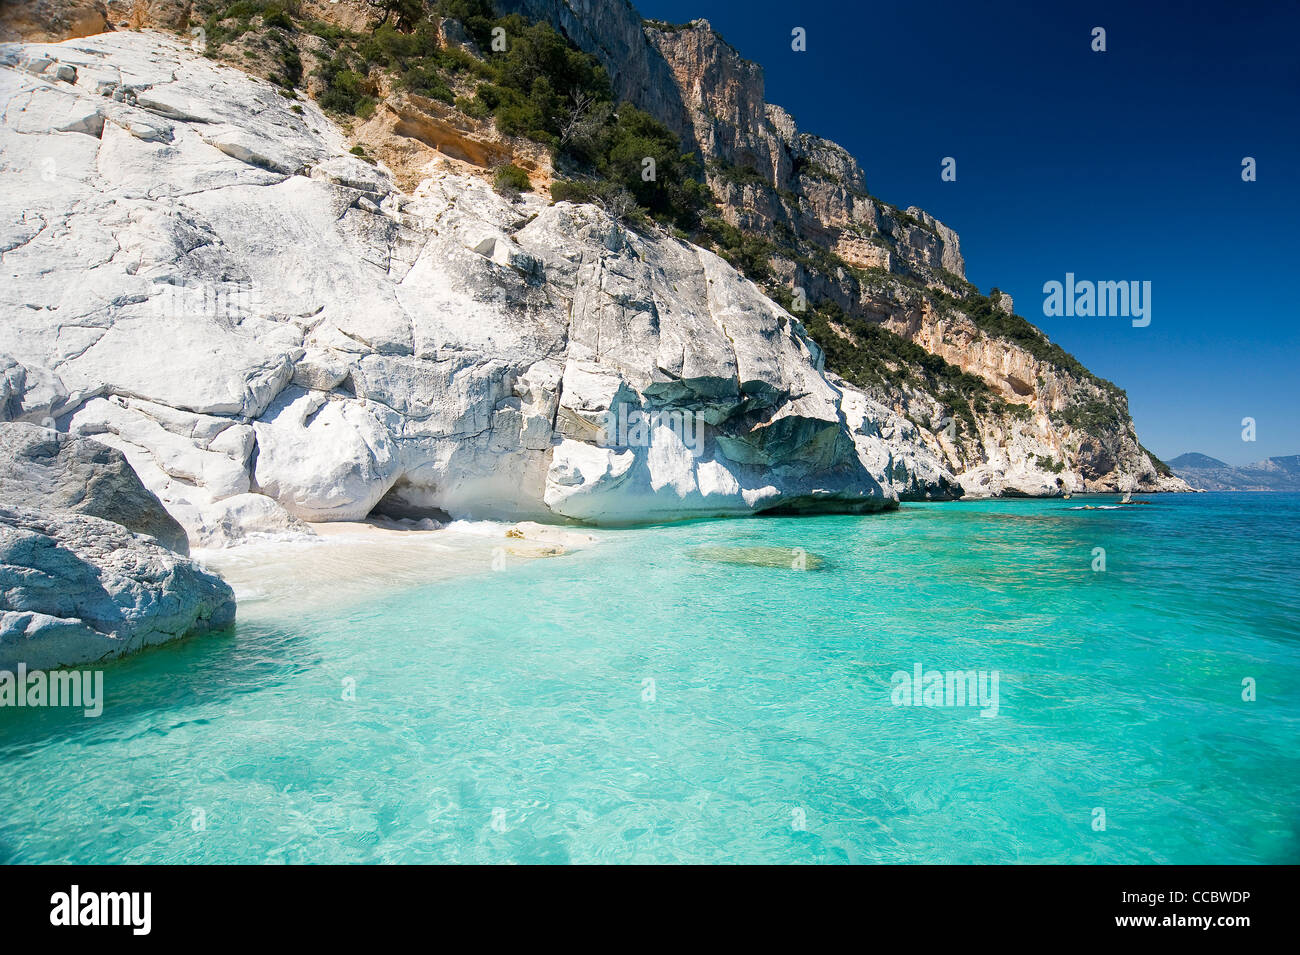 Orosei Italy  city photo : ... , Baunei, Provincia Ogliastra, Golfo di Orosei, Sardinia, Italy